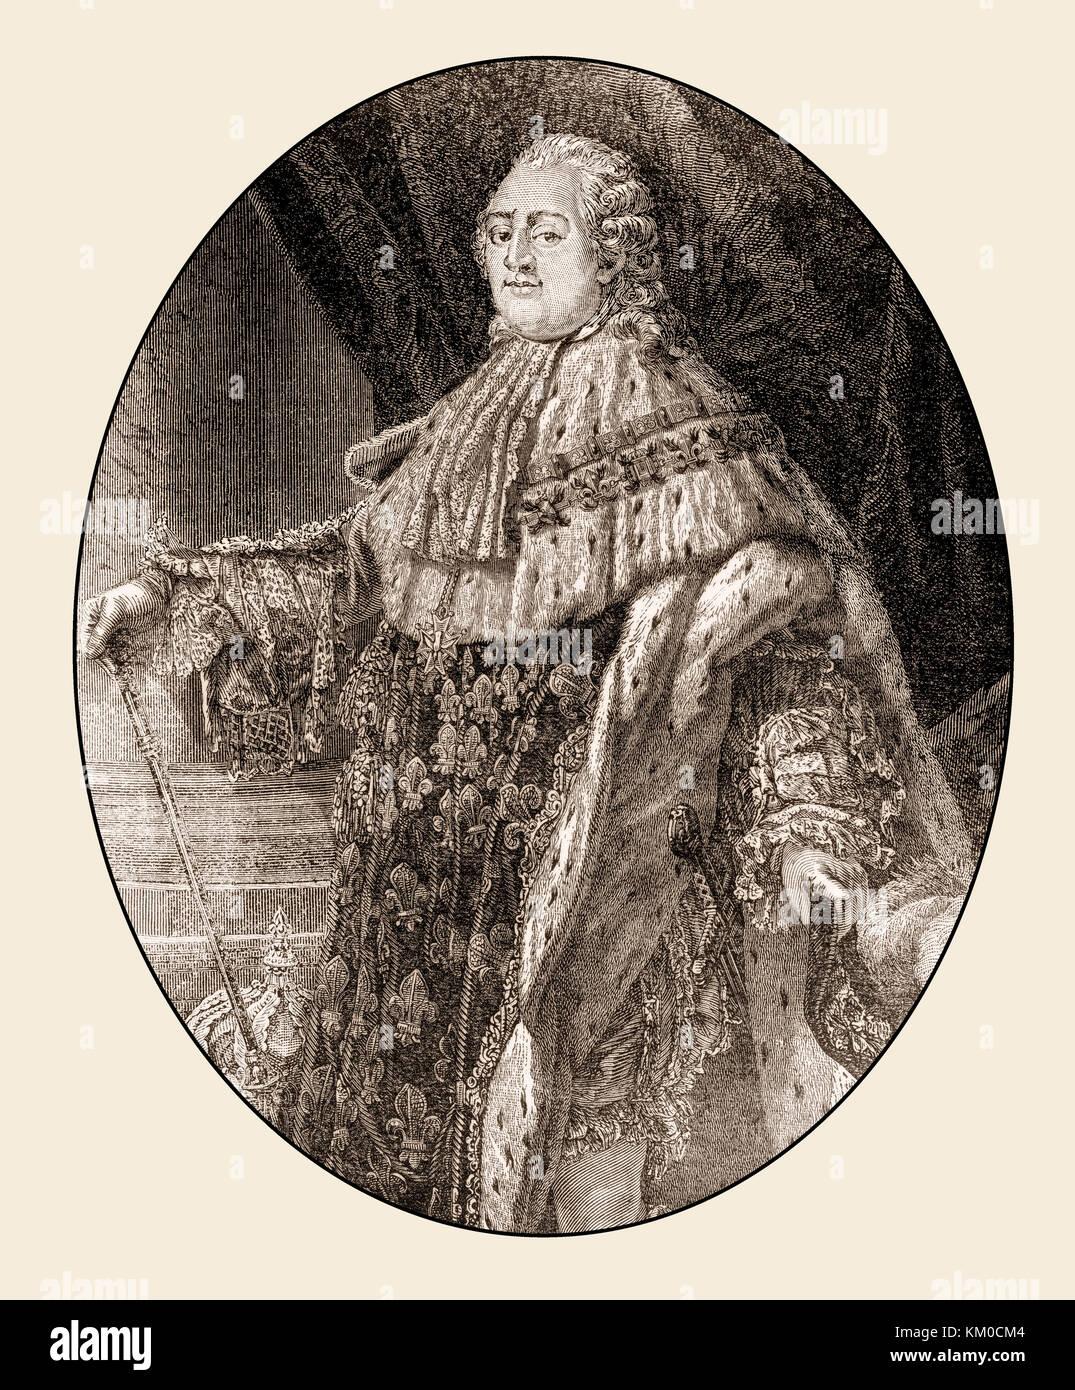 Louis XVI, king of France - Stock Image